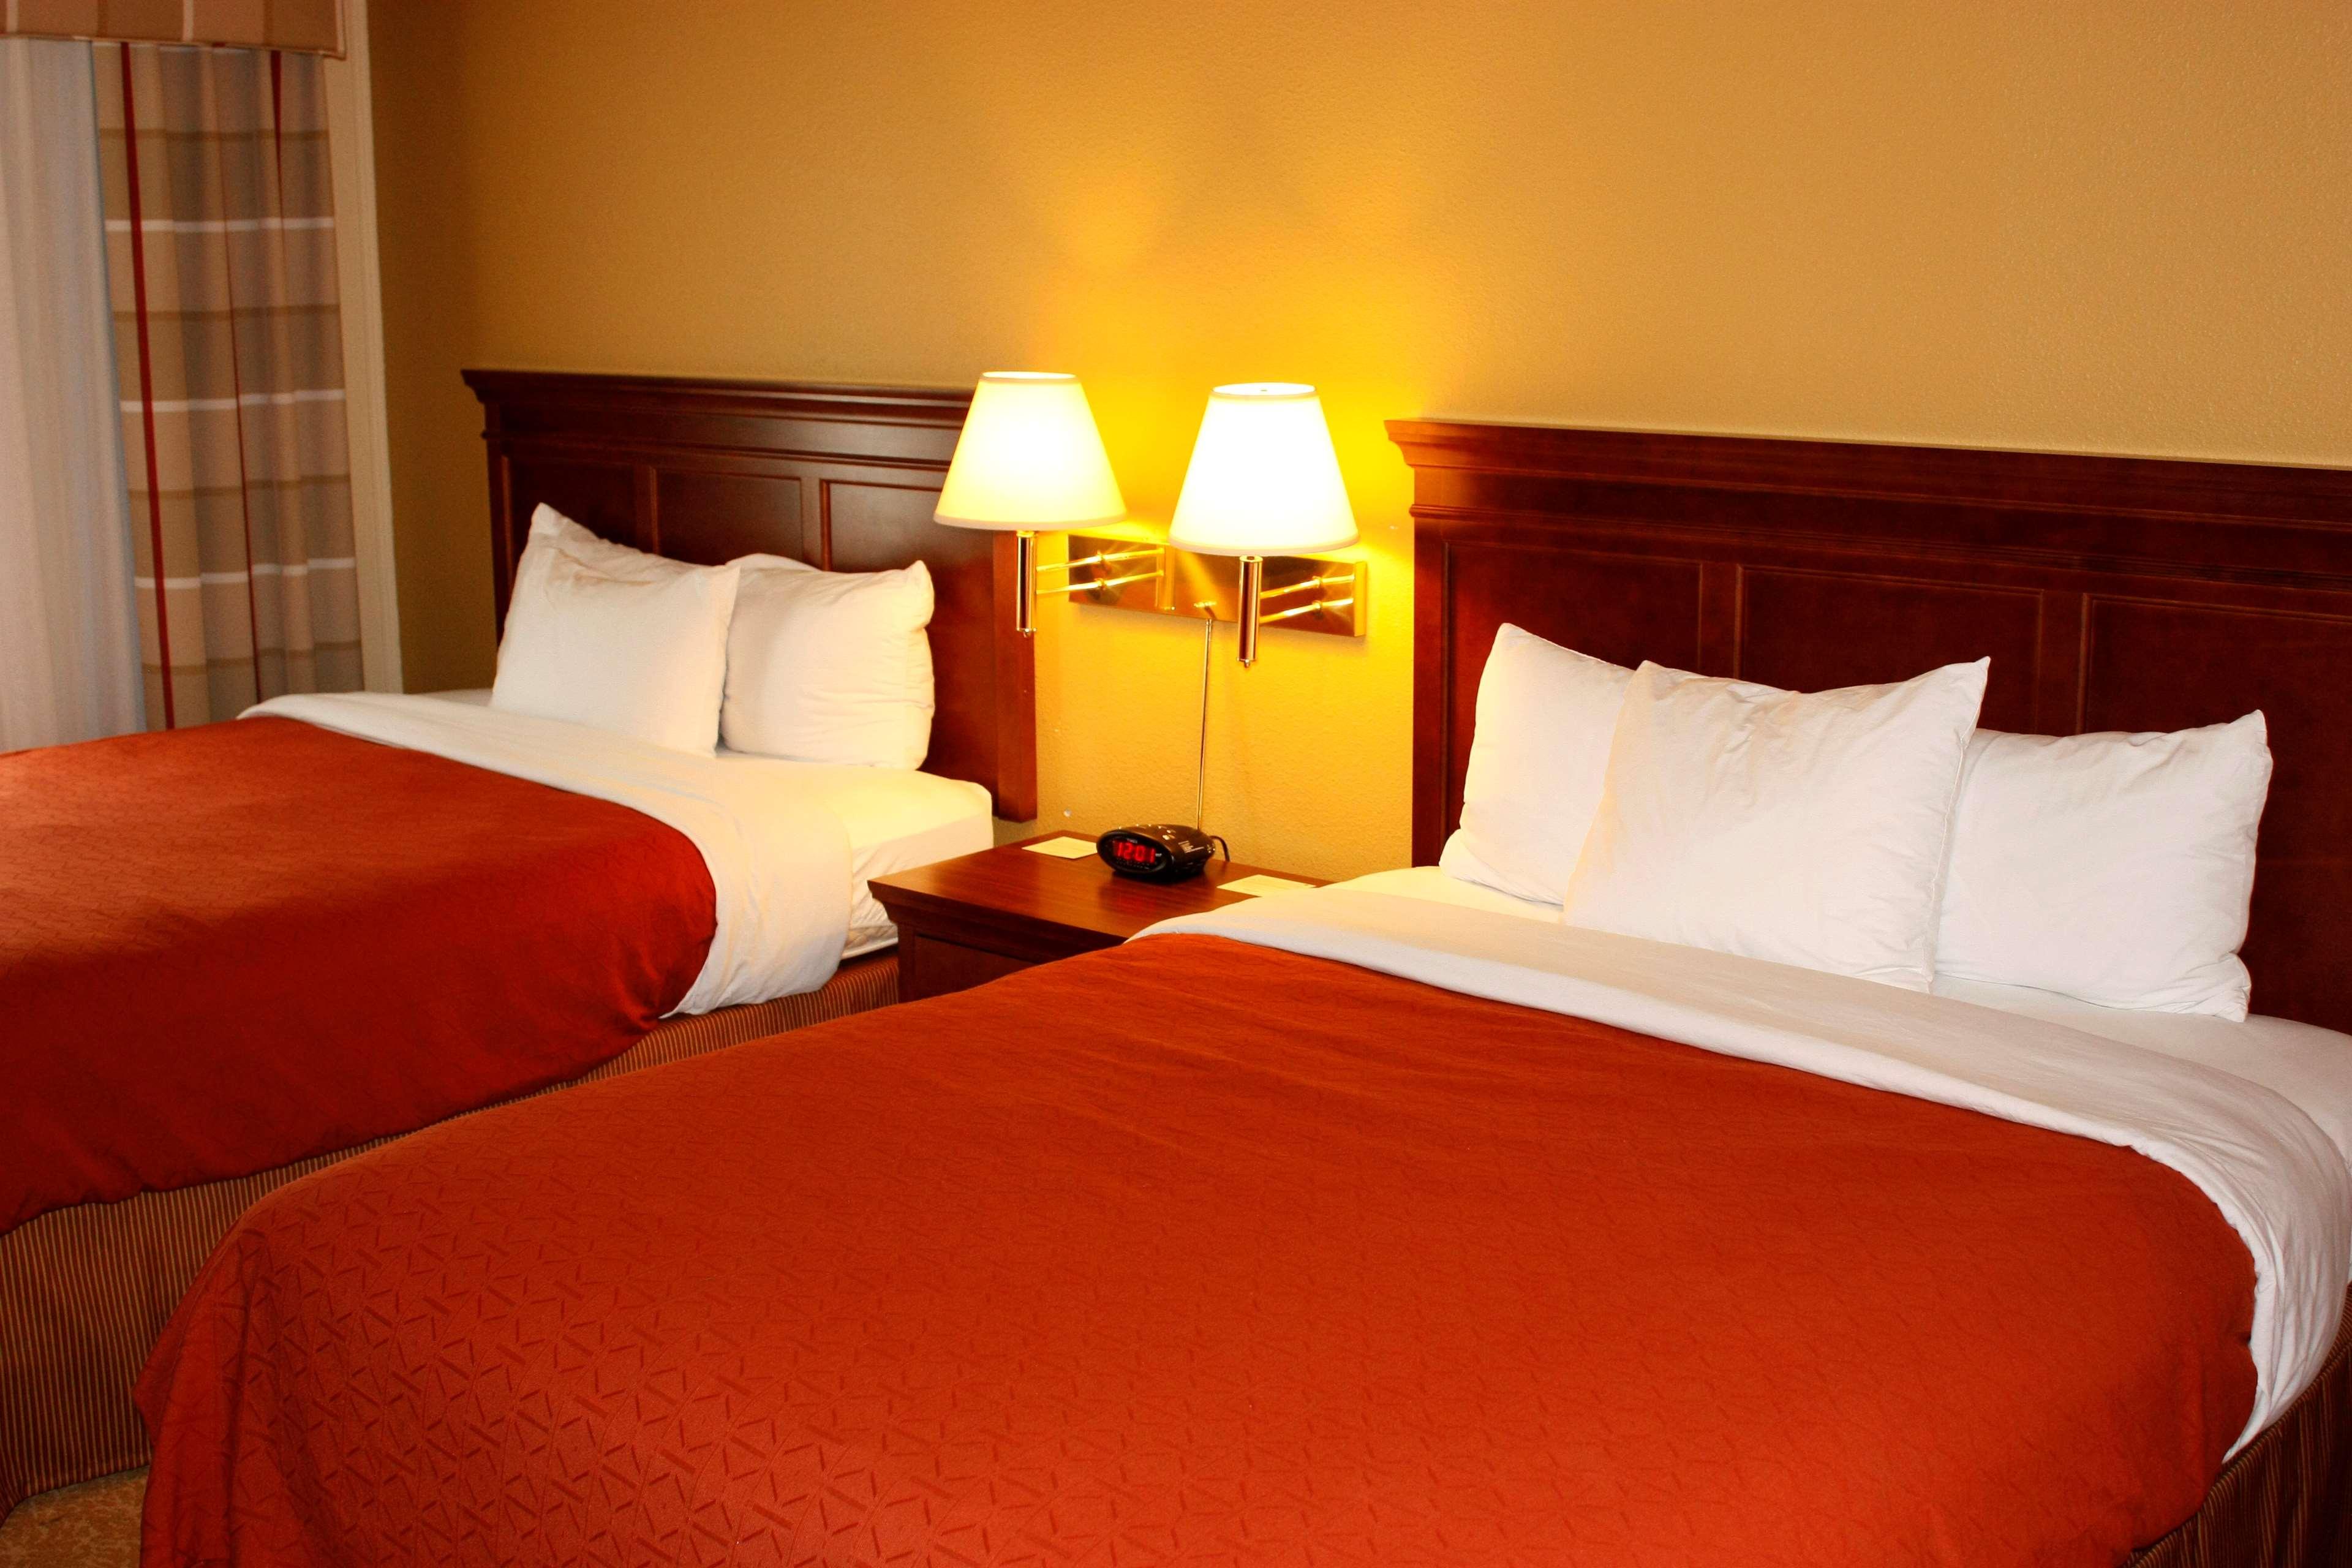 Country Inn & Suites by Radisson, Saskatoon, SK in Saskatoon: 2 Queen Beds